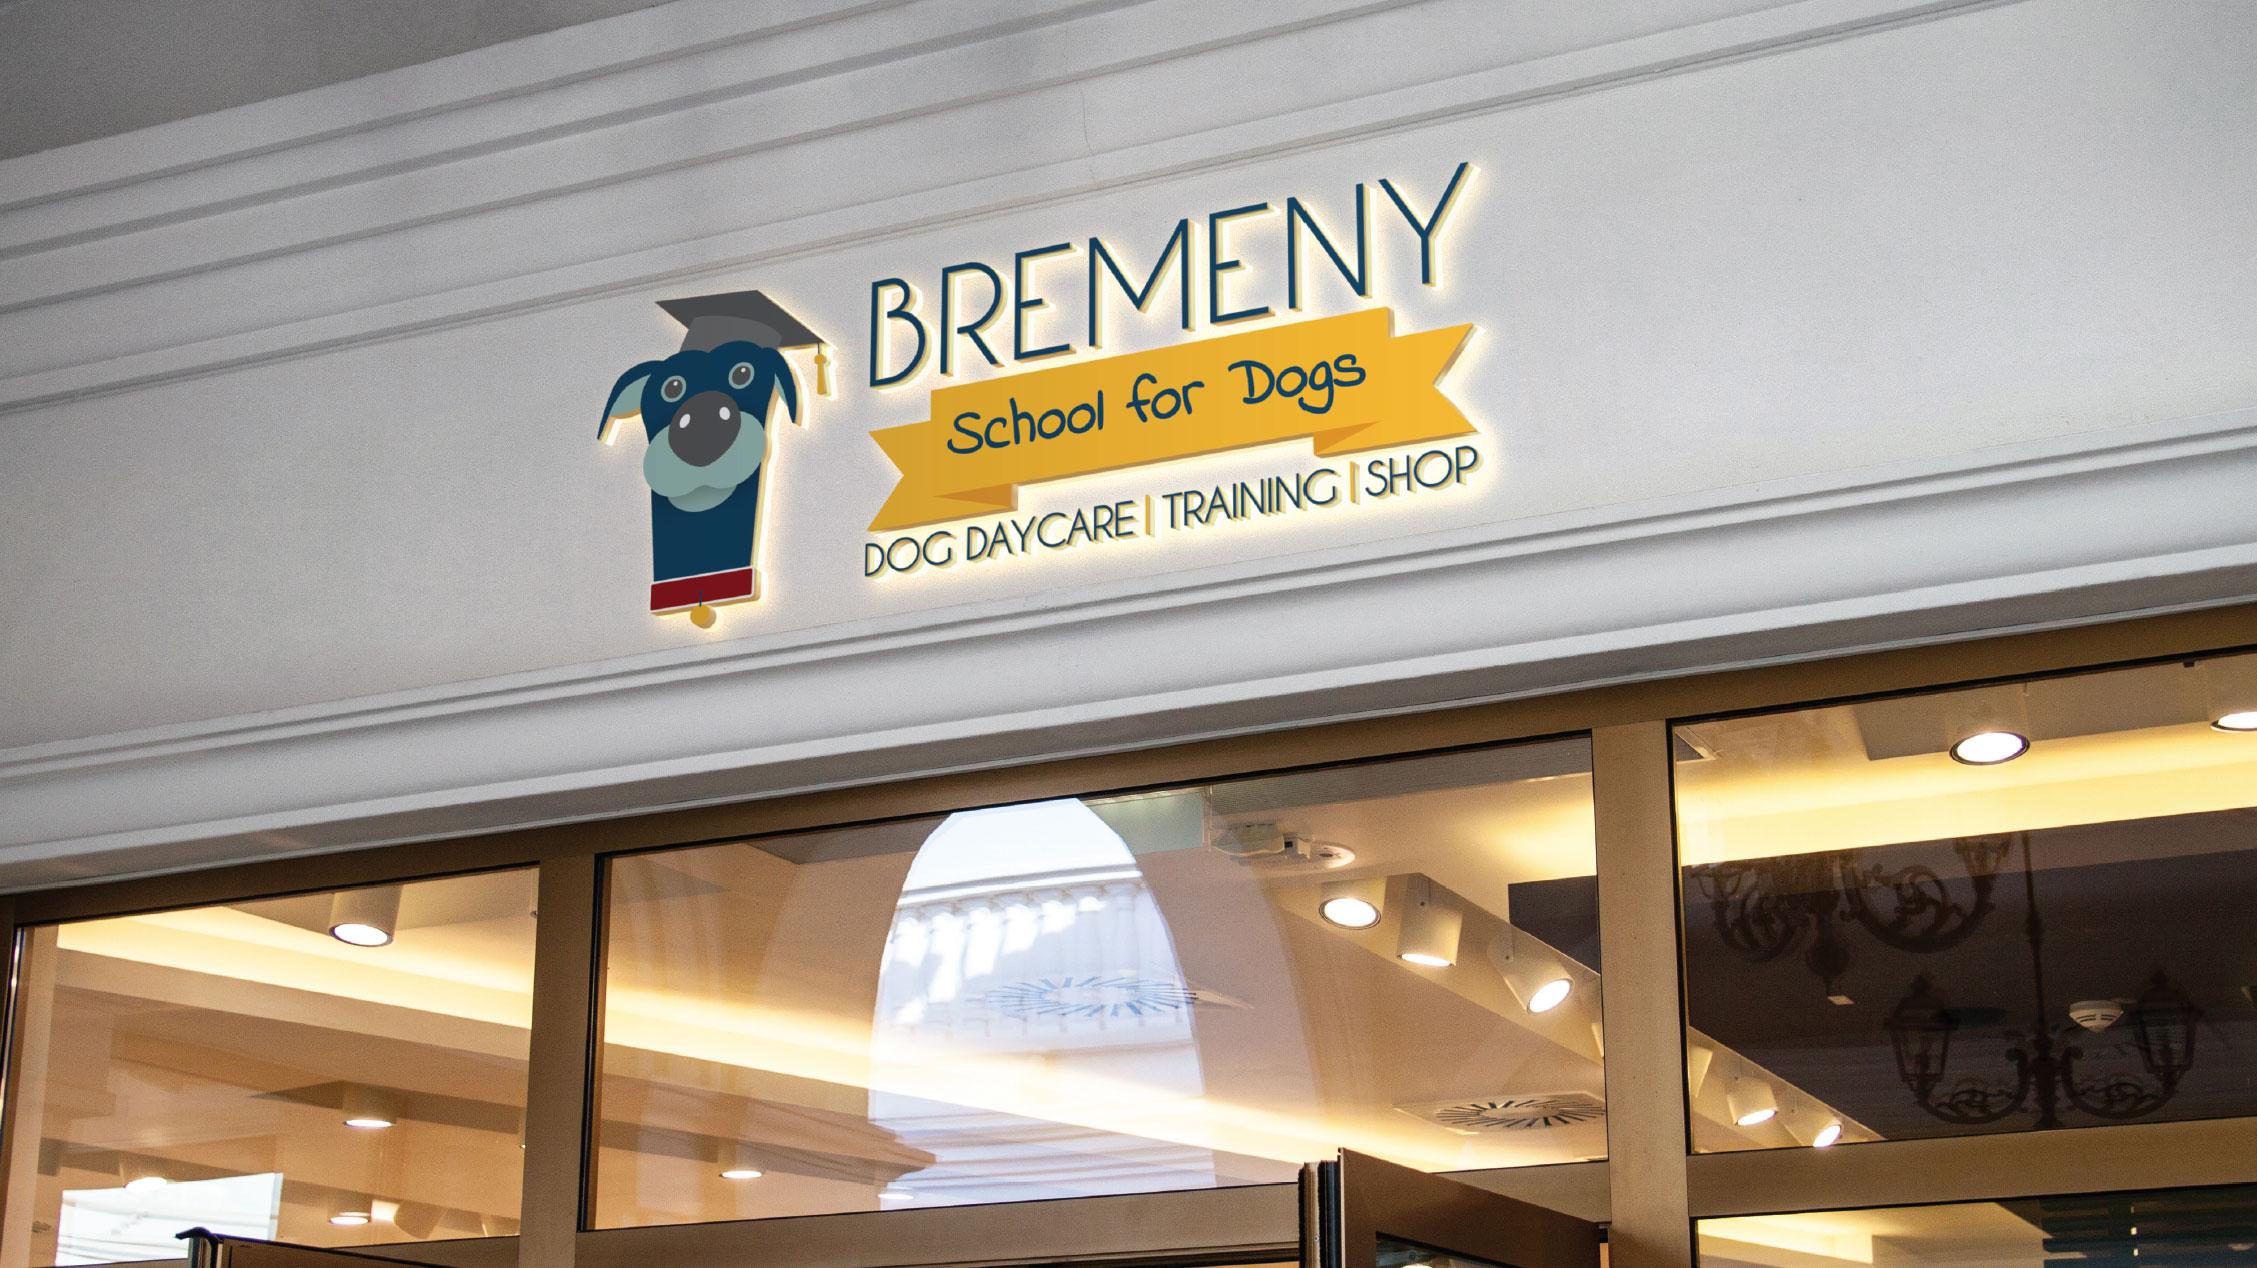 Bremeny School for Dogs Brand Design